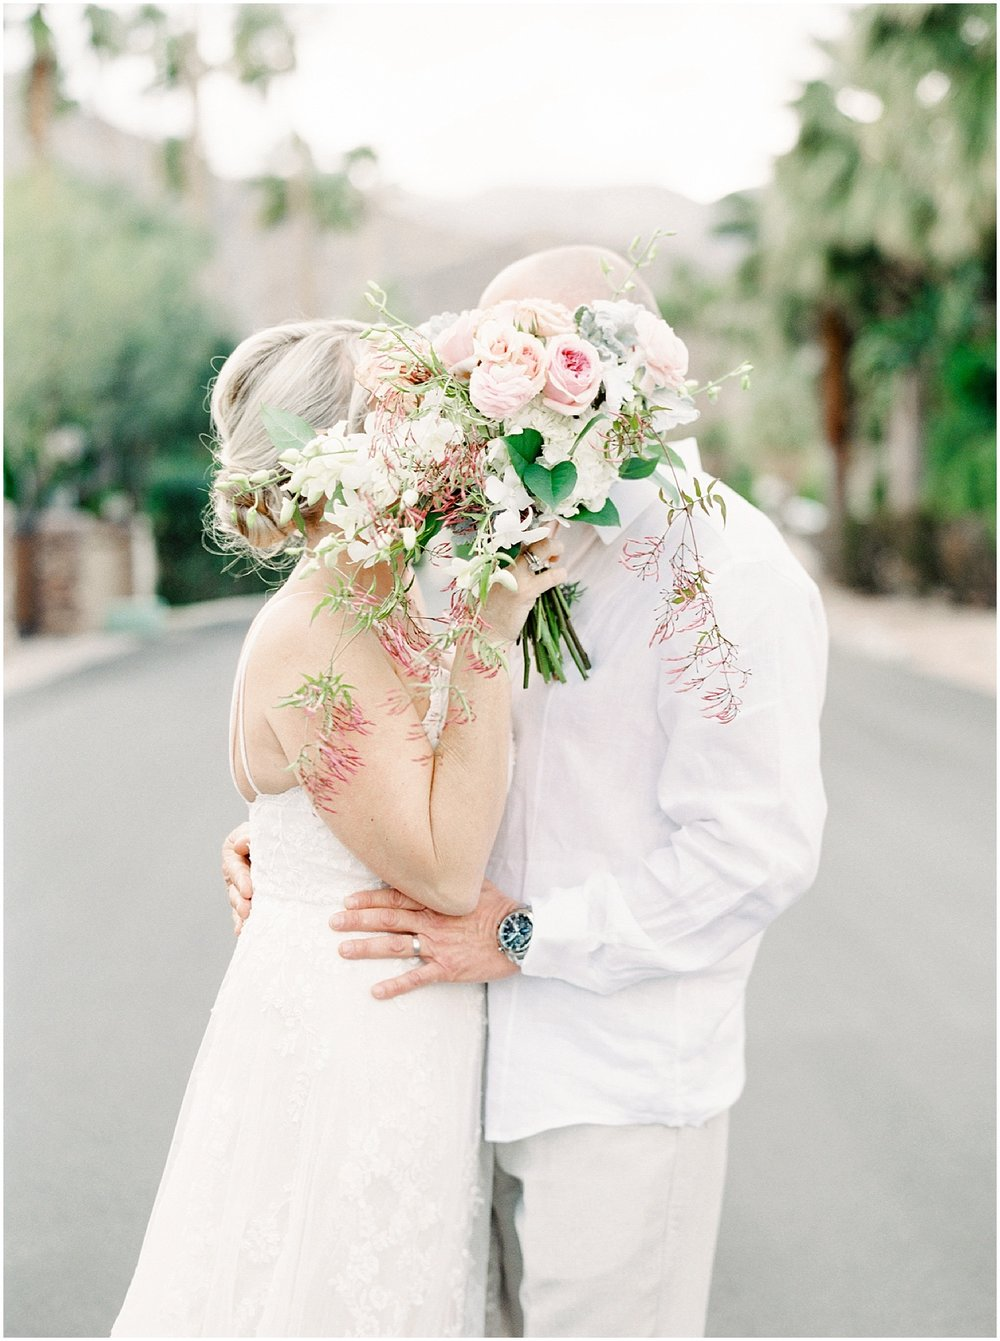 monika & jakub    Intimate Wedding // Palm Springs, California     Open Gallery